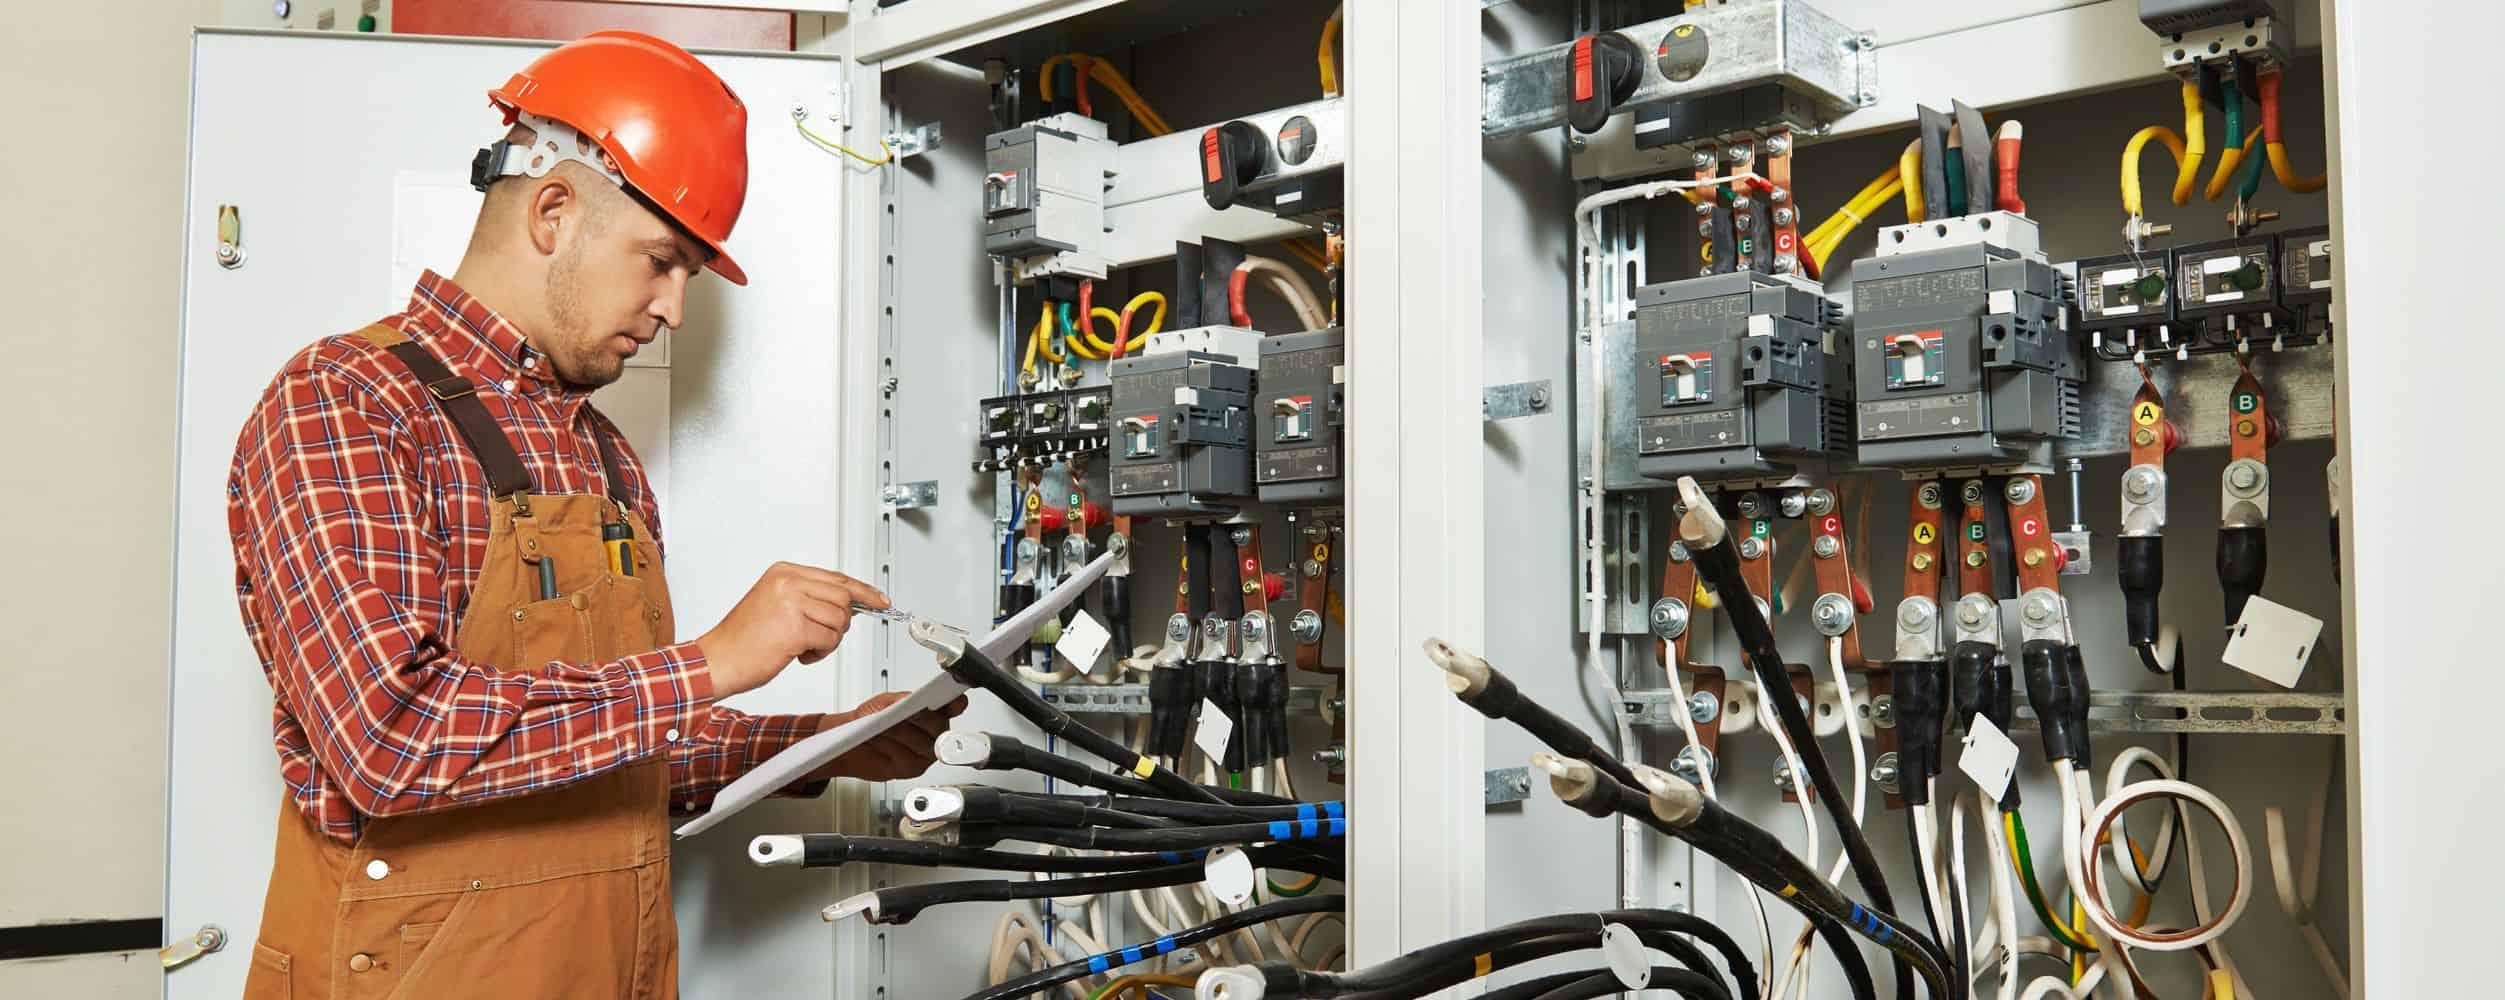 elektrikár, údržbár elektro